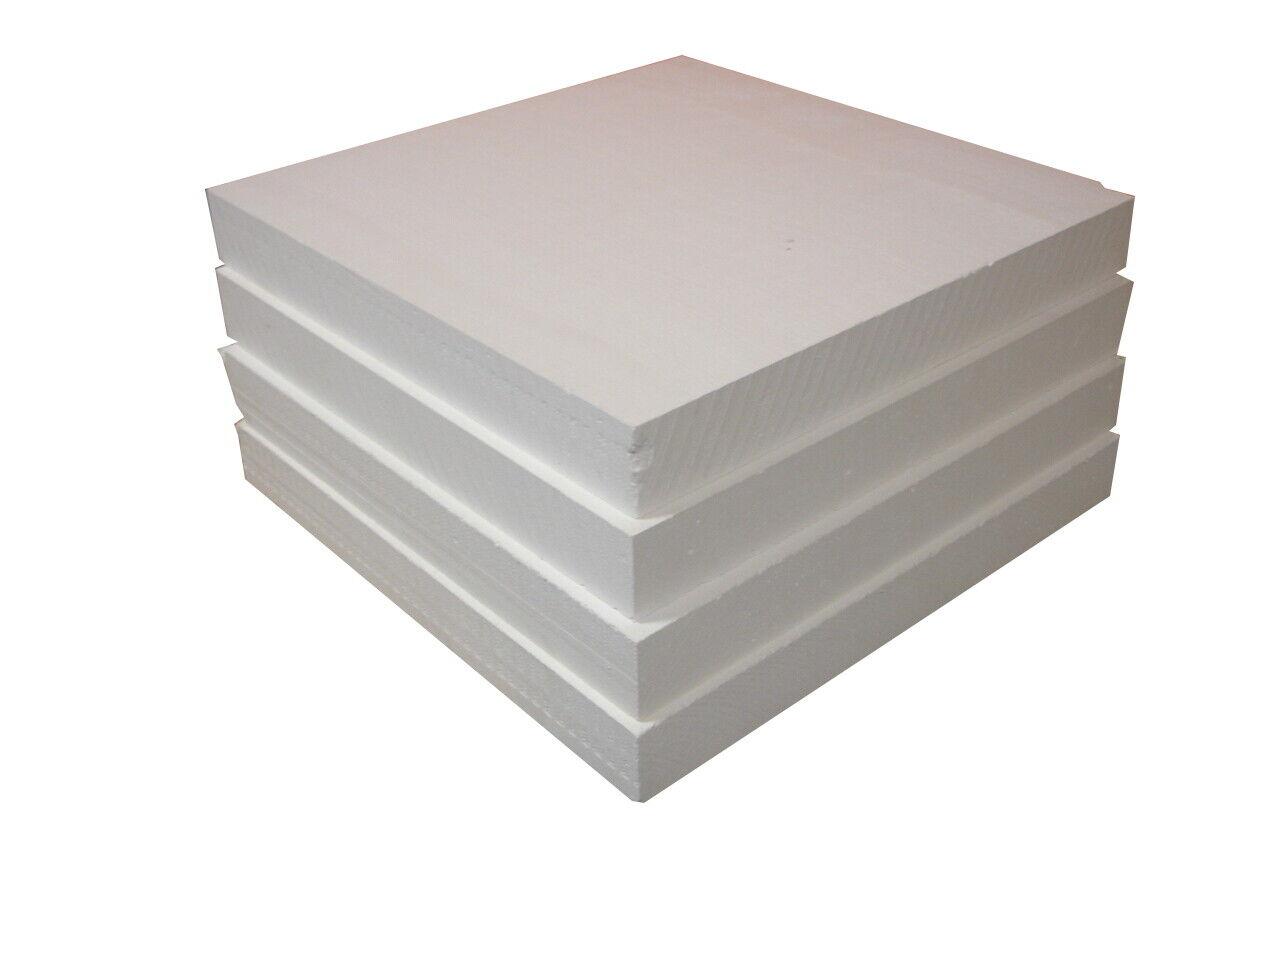 Promat Promasil 950 KS Isolierplatte Wärmedämmung 3 Platten 30 mm, 1000 x 500 mm